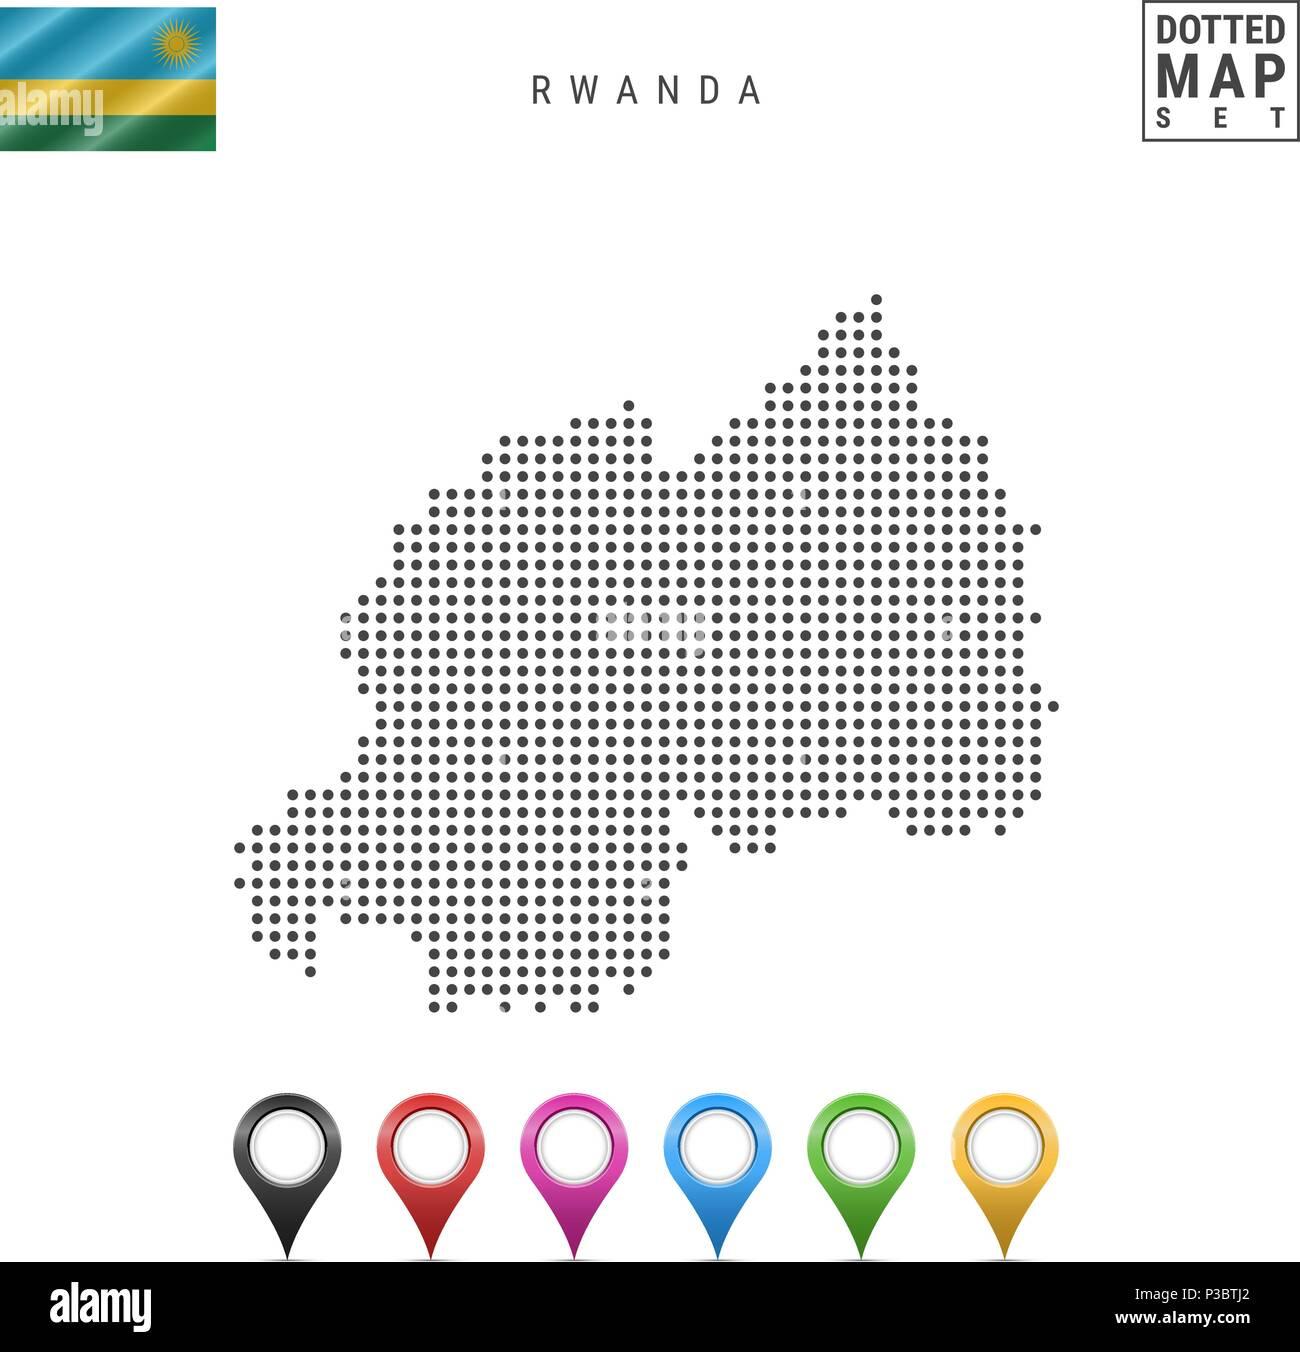 Vector Dotted Map of Rwanda. Simple Silhouette of Rwanda. The National Flag of Rwanda. Set of Multicolored Map Markers - Stock Vector